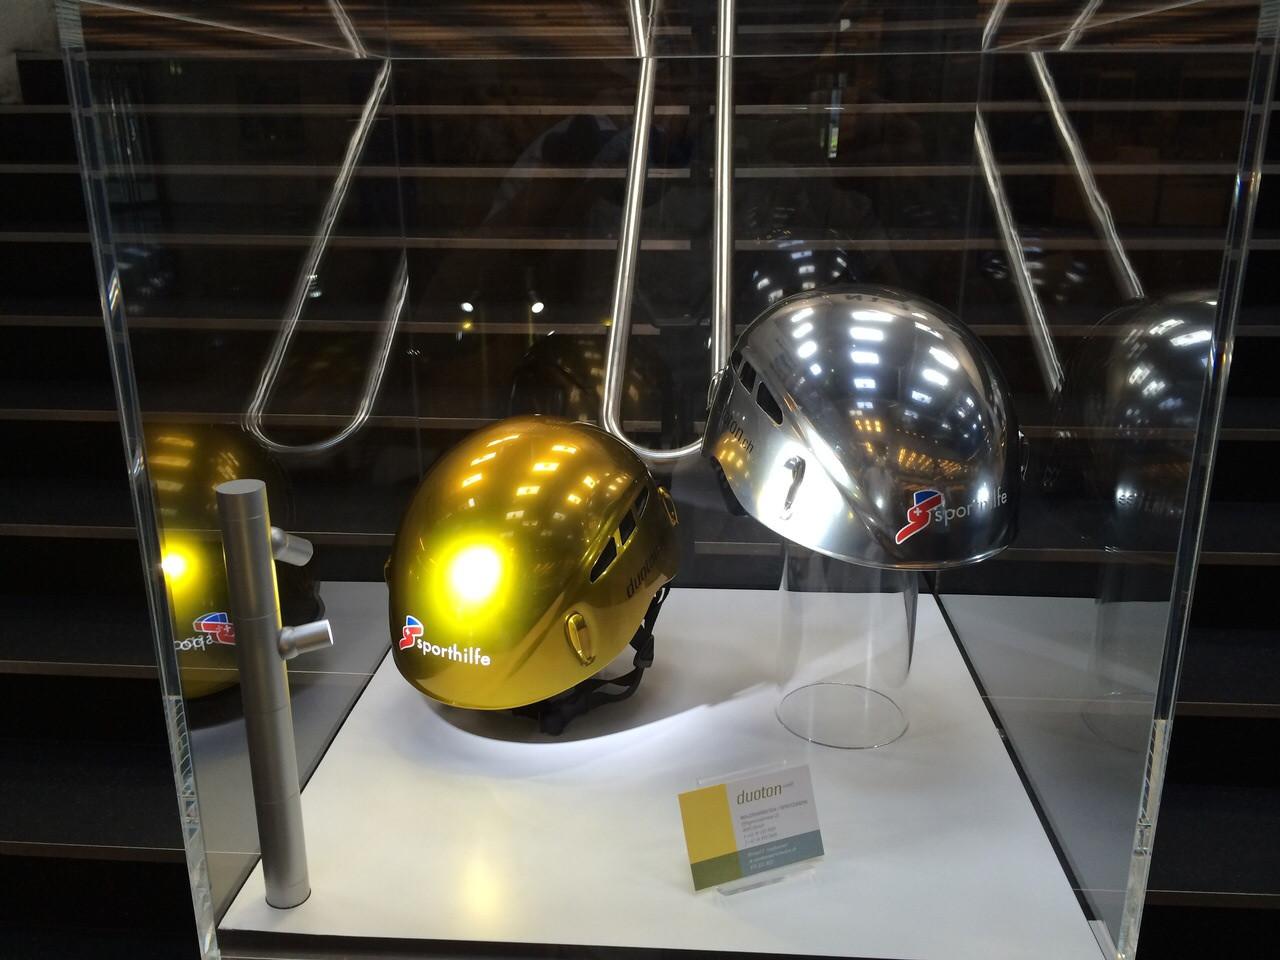 Chromeffektlackierung silber & gold